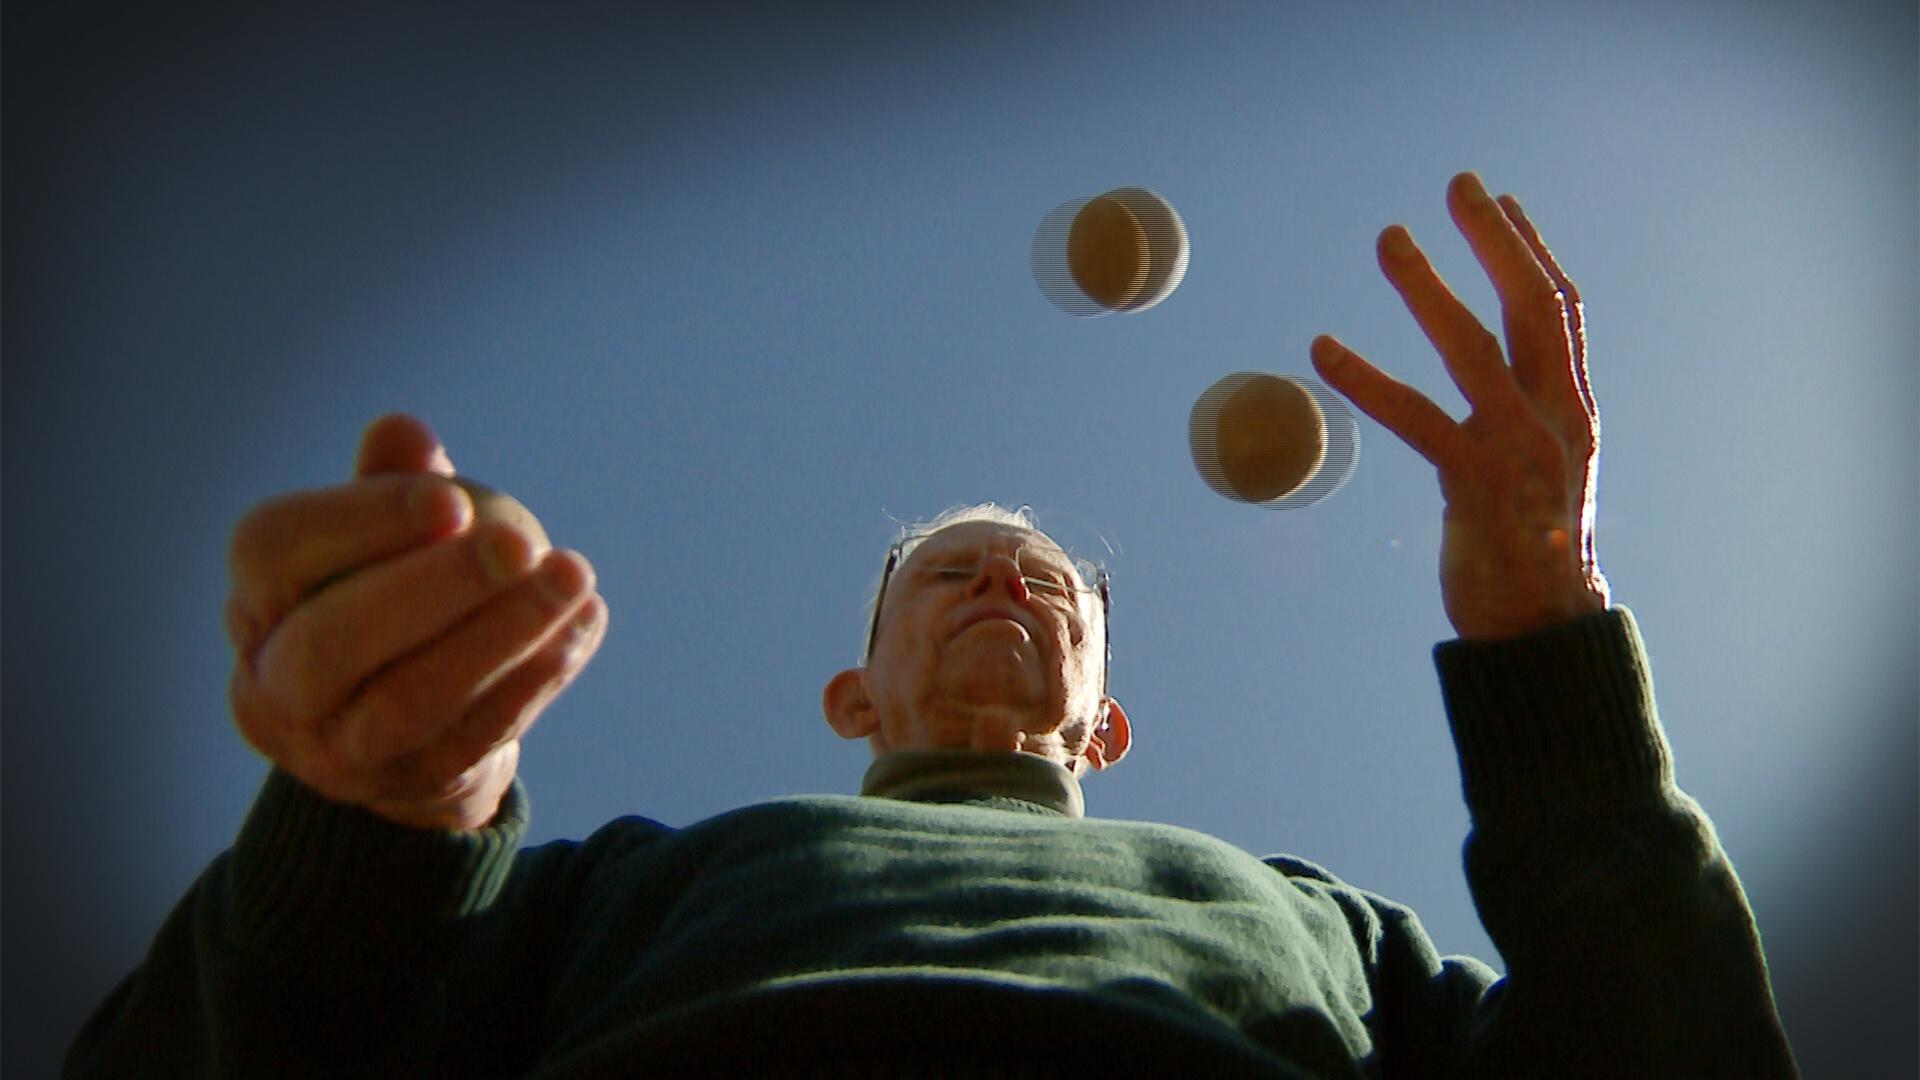 Juggle, Brain, Mr. Rogers.